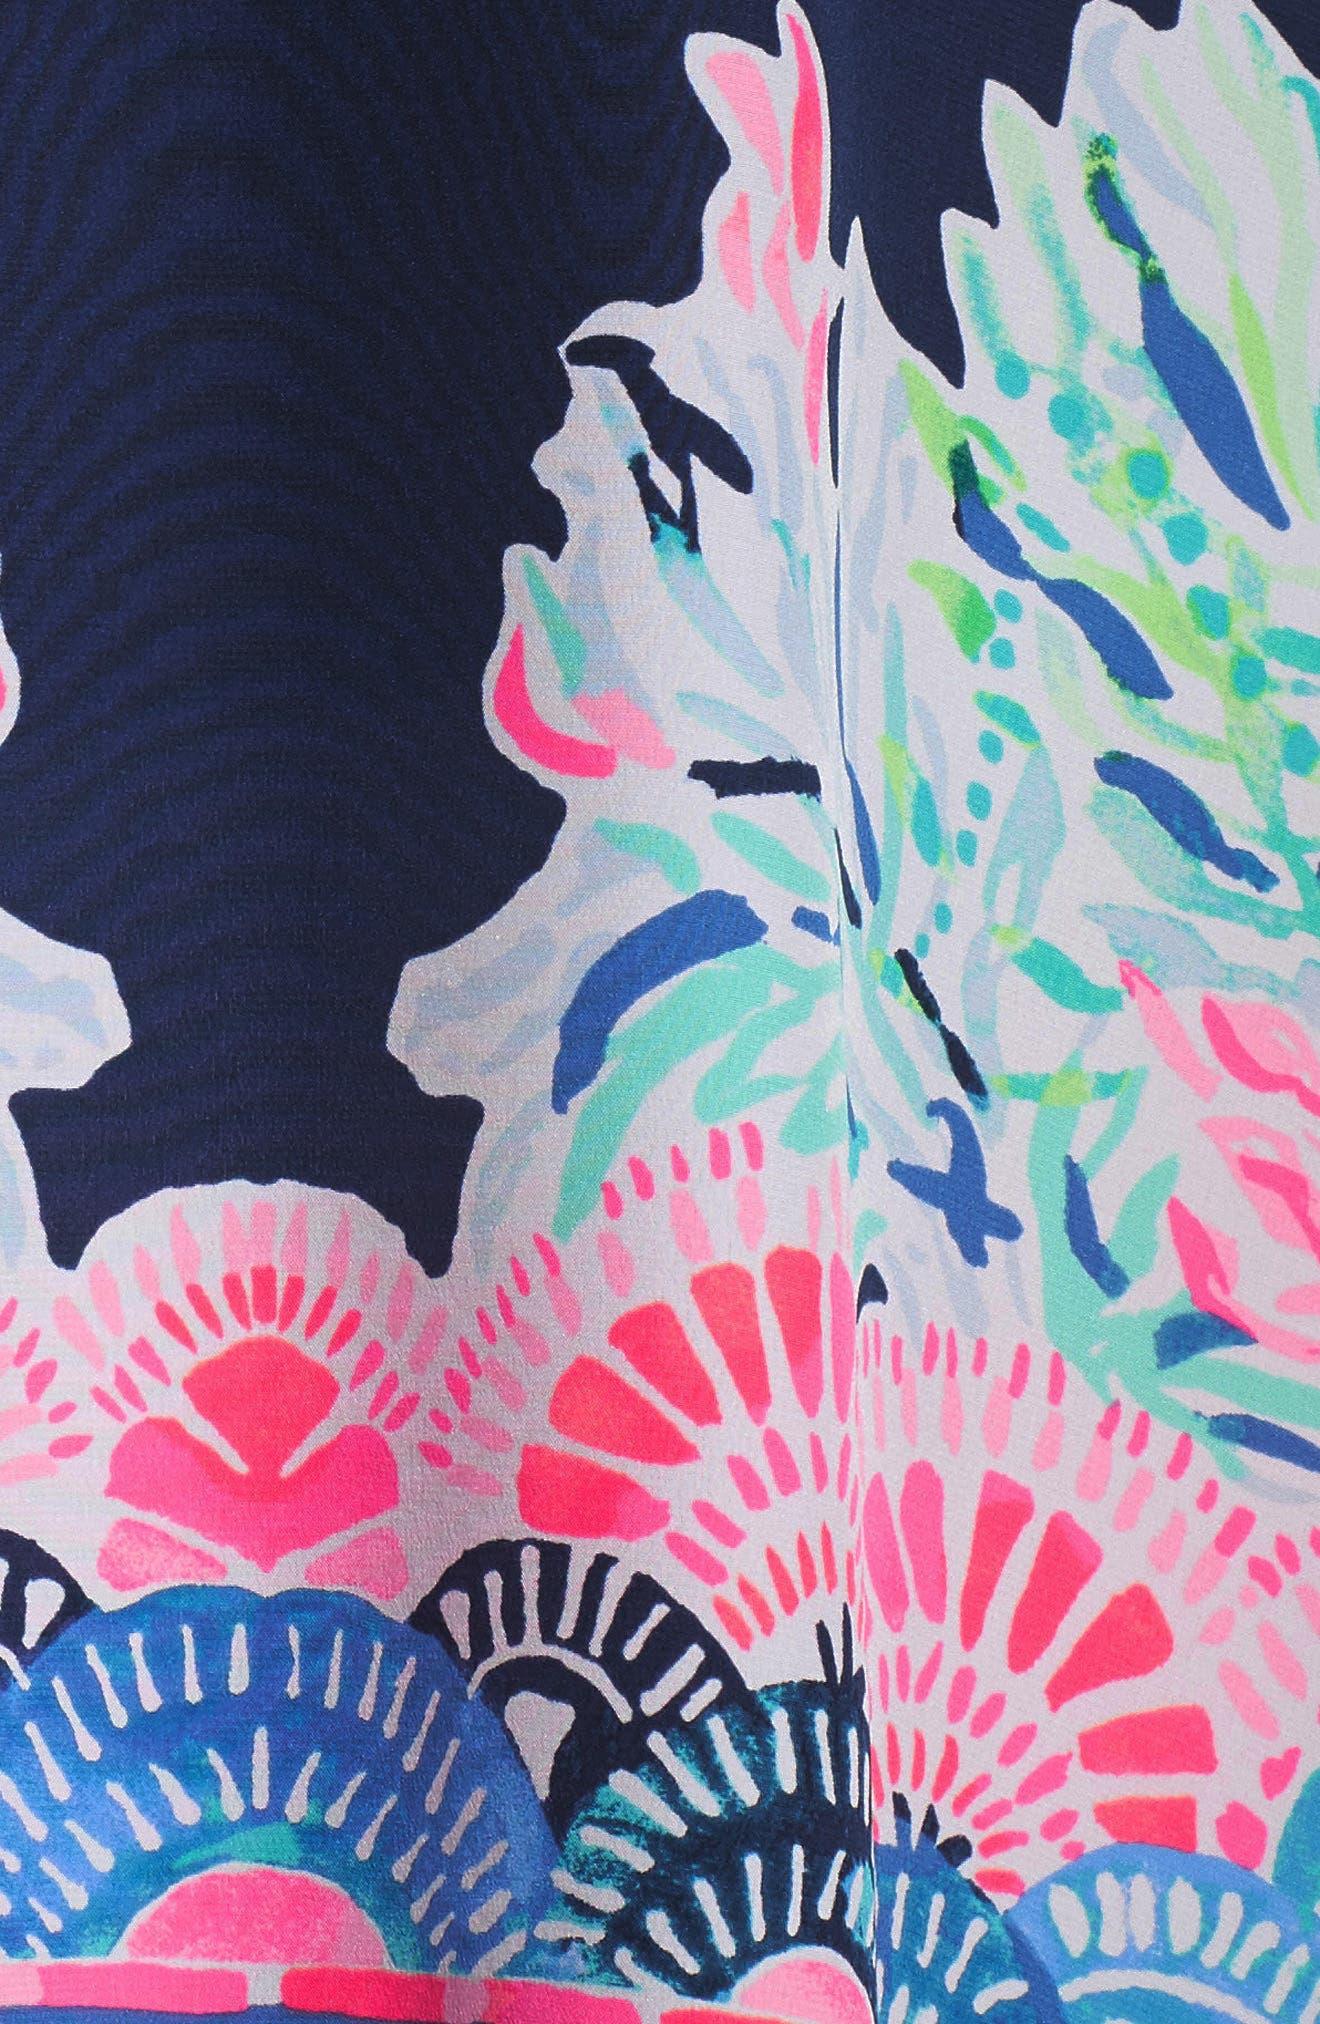 Atlin Cold Shoulder Silk Caftan,                             Alternate thumbnail 5, color,                             Deep Indigo Seaglass Menage